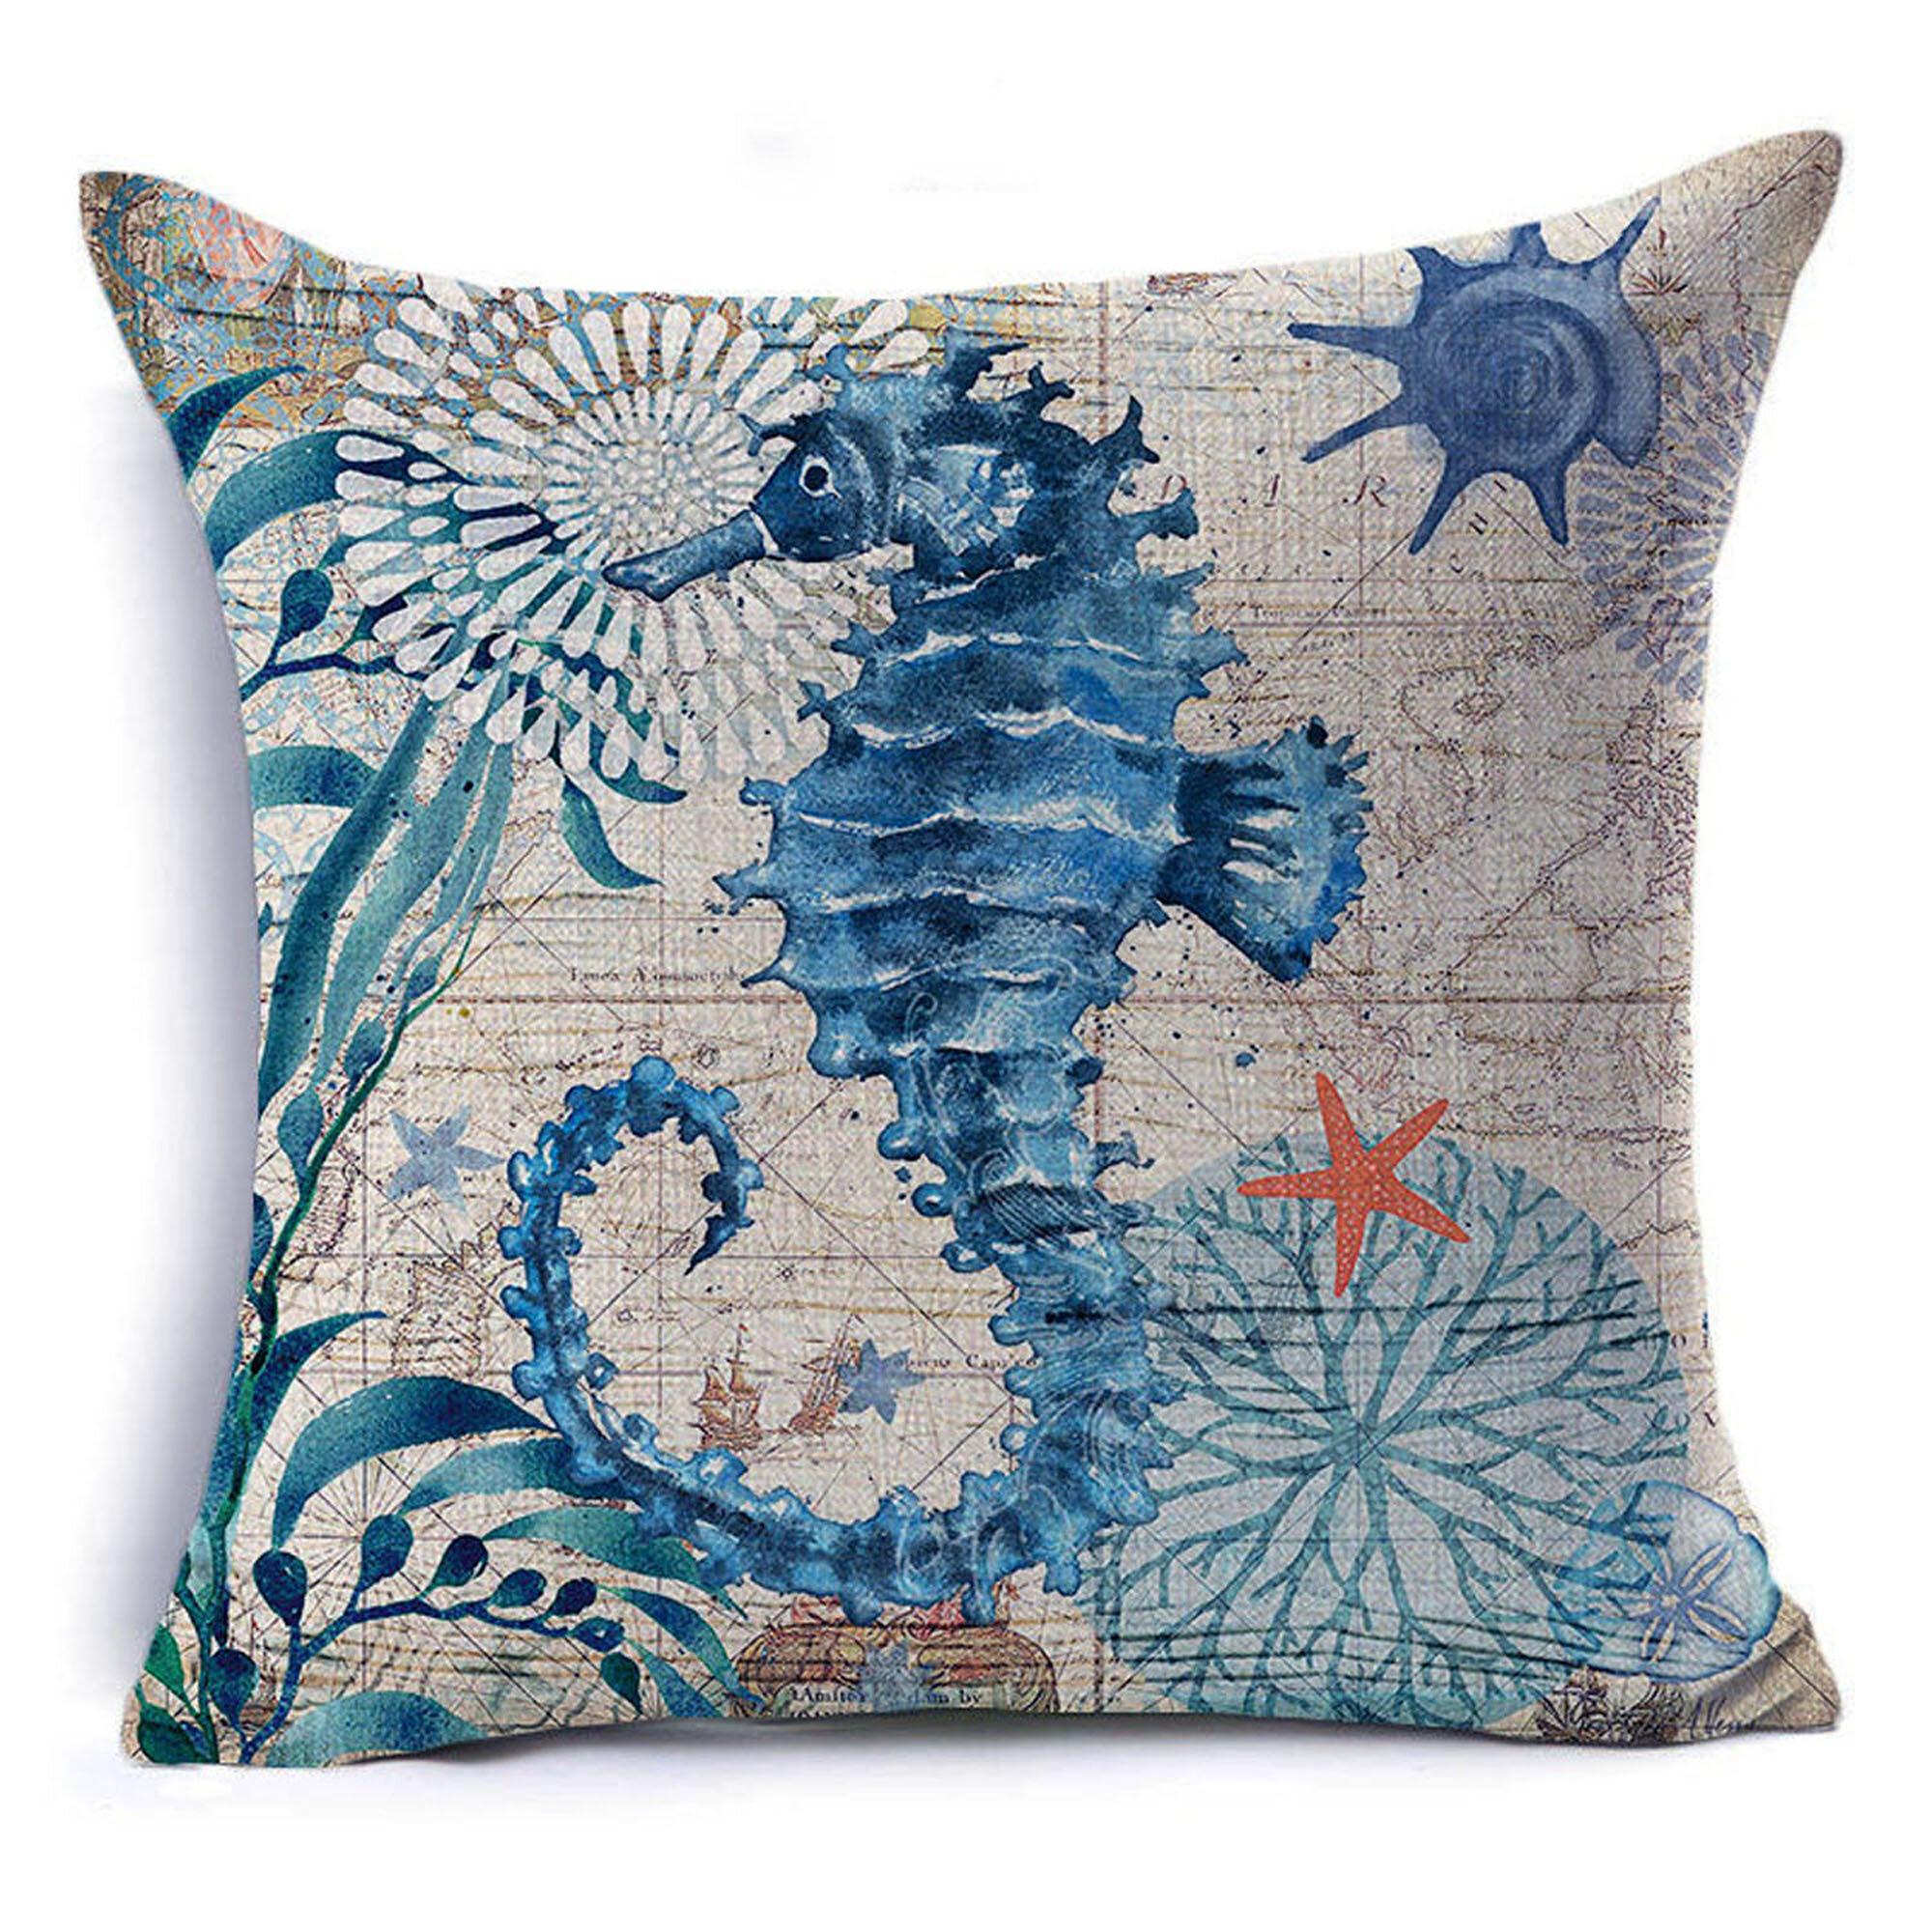 Breakwater Bay Siegrist Seahorse Cotton Throw Pillow Reviews Wayfair